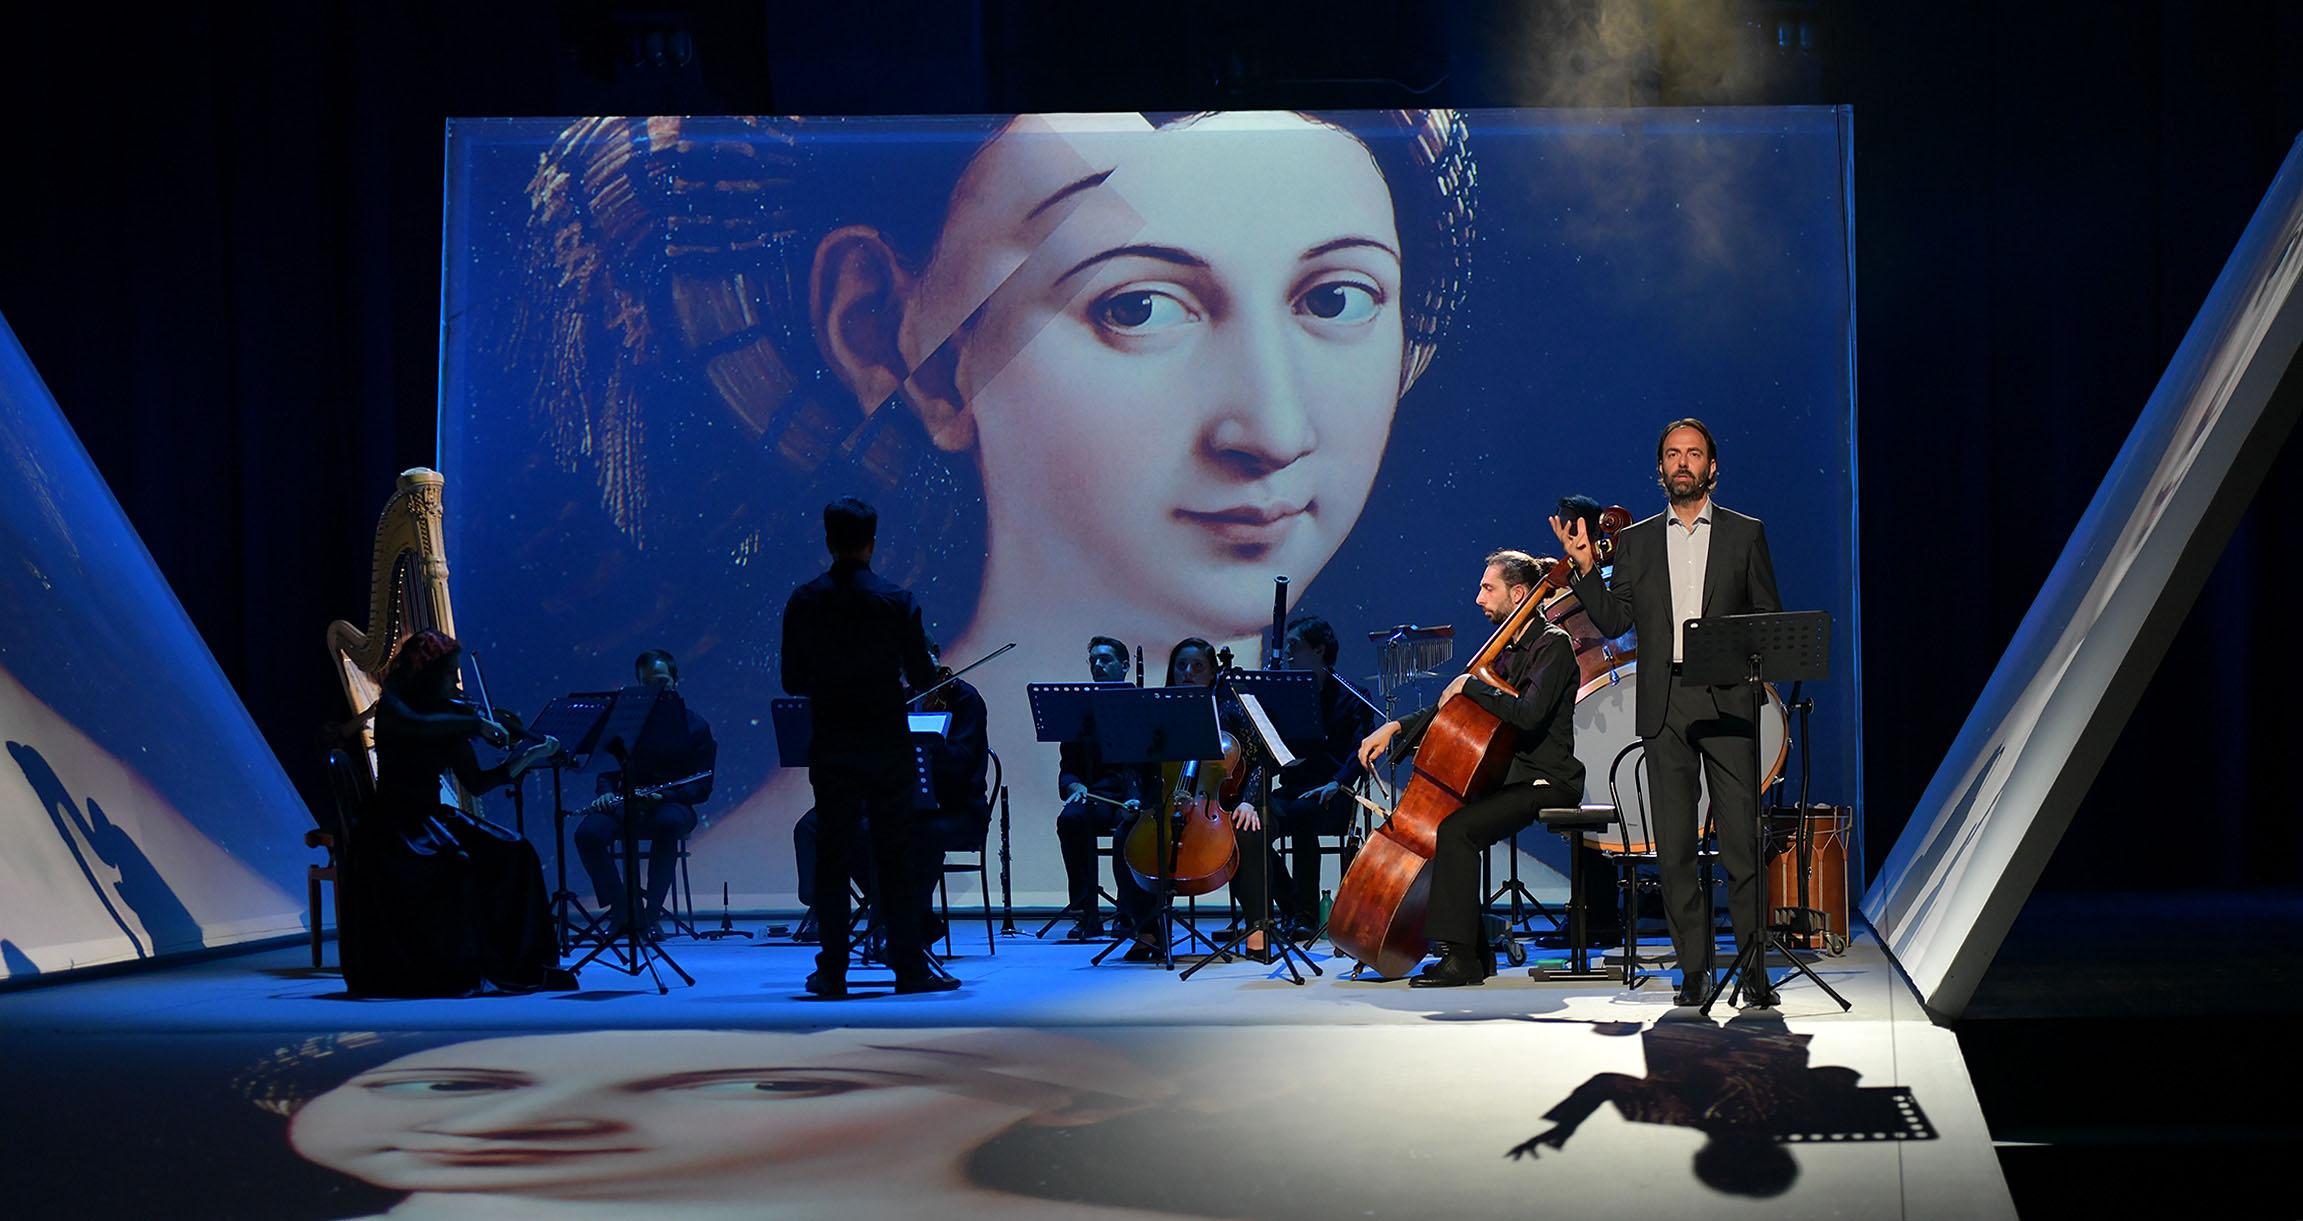 Rispondimi bellezza_Neri Marcore-Marco Attura_Time Machine Ensemble5 (1)